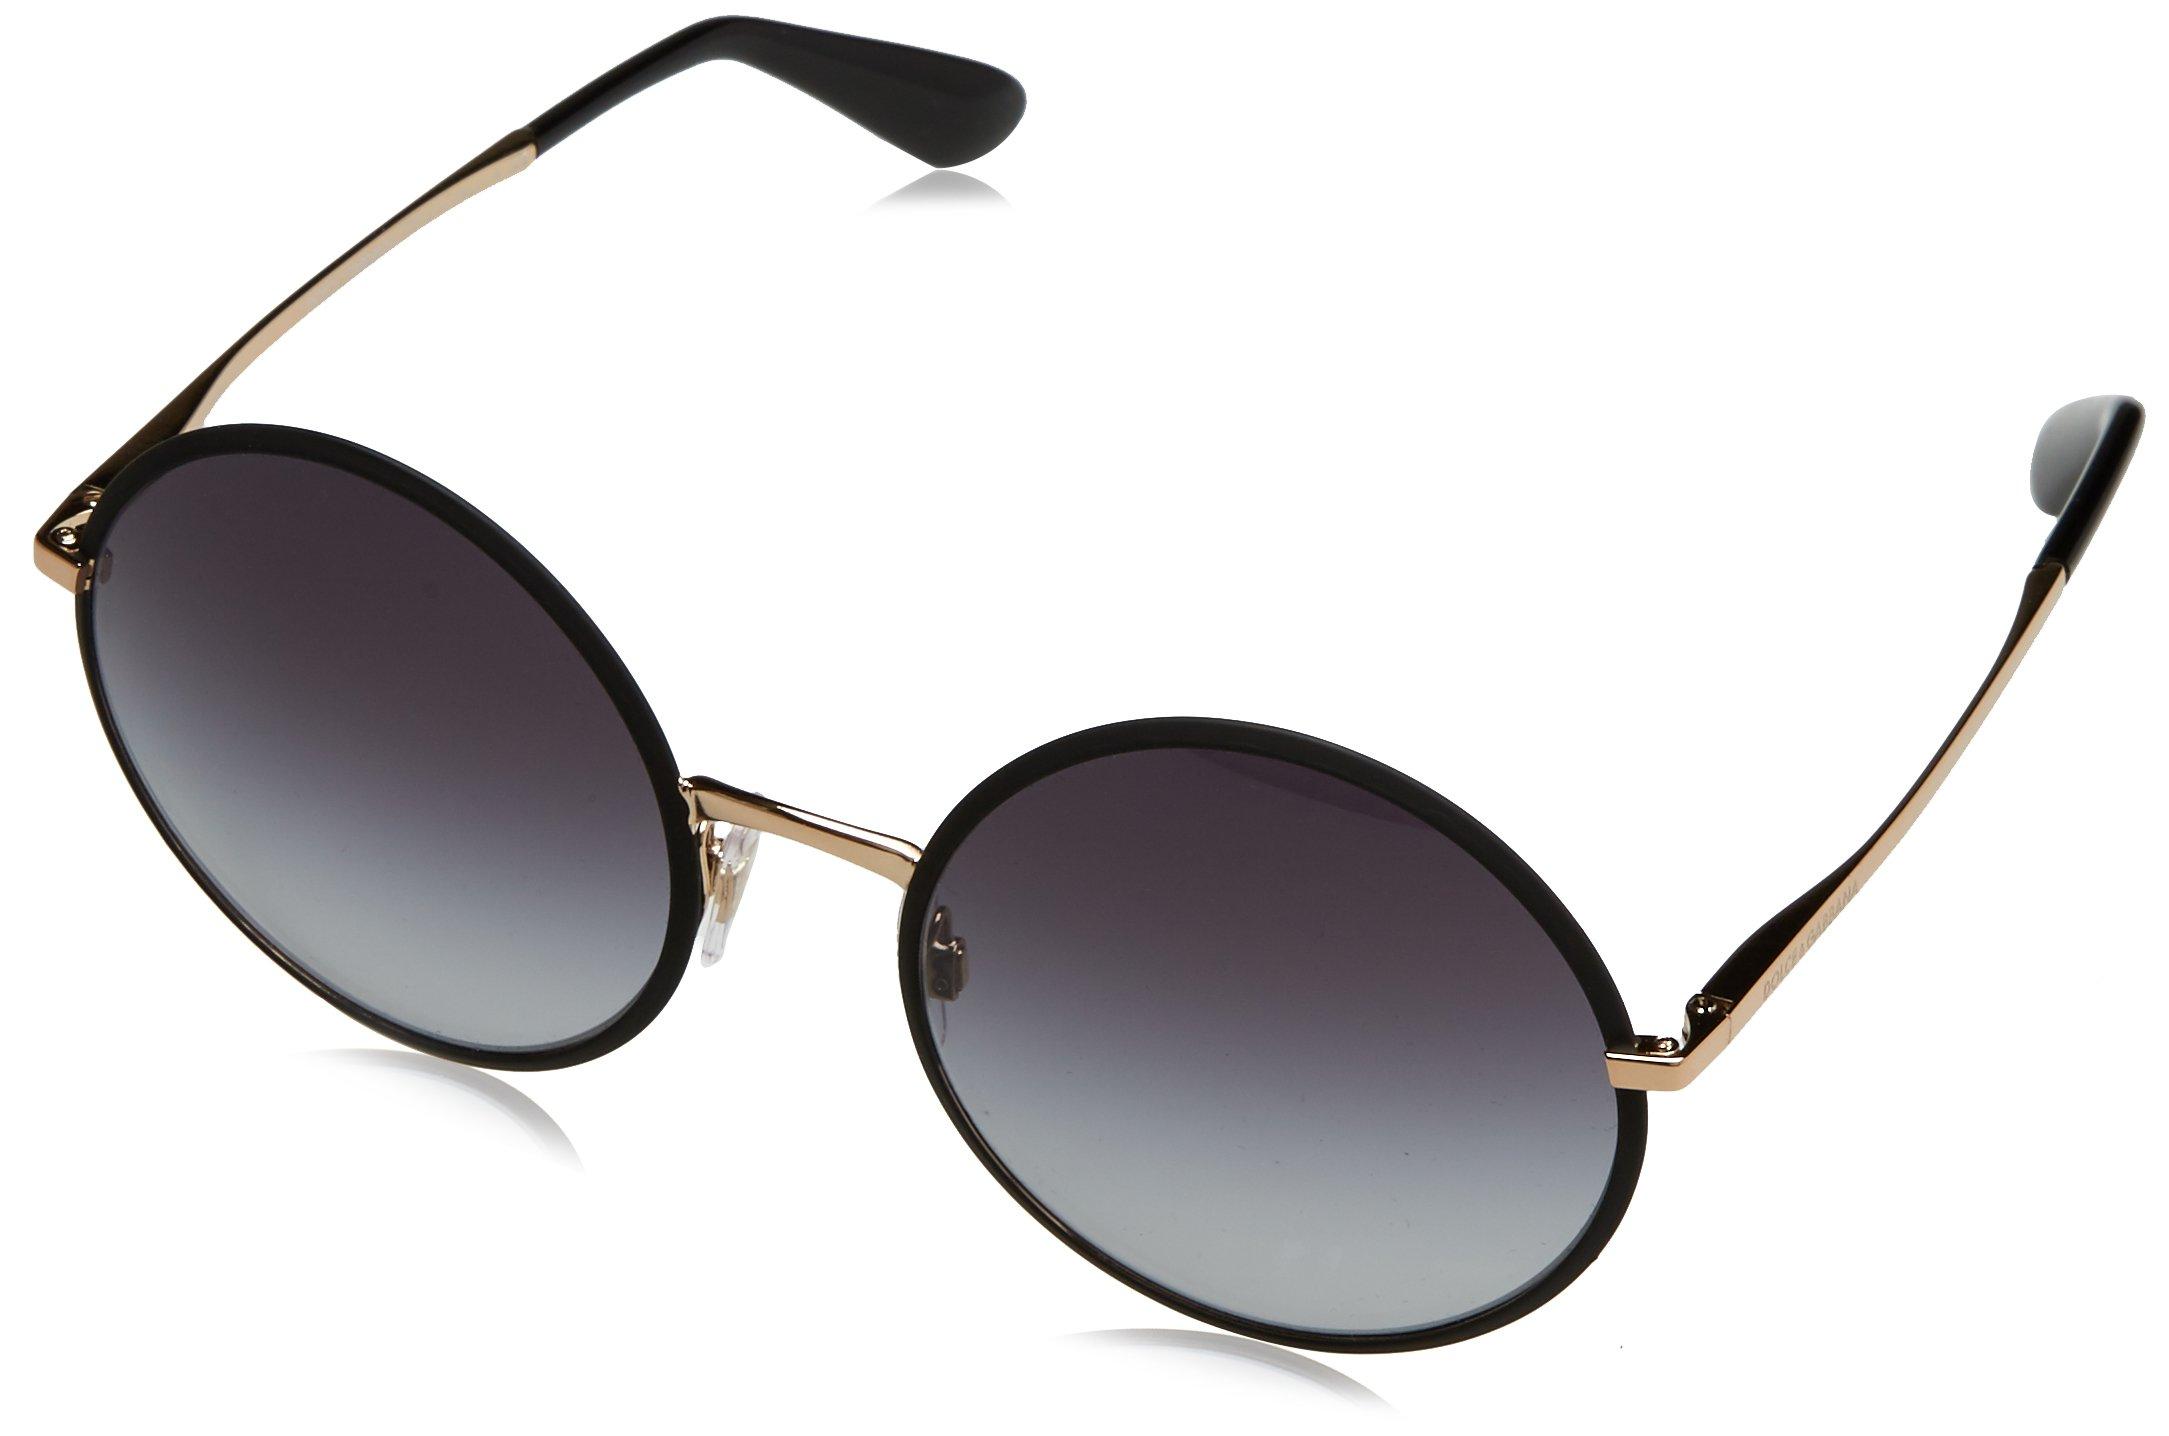 Dolce & Gabbana Women's Metal Woman Round Sunglasses, Matte Black, 56 mm